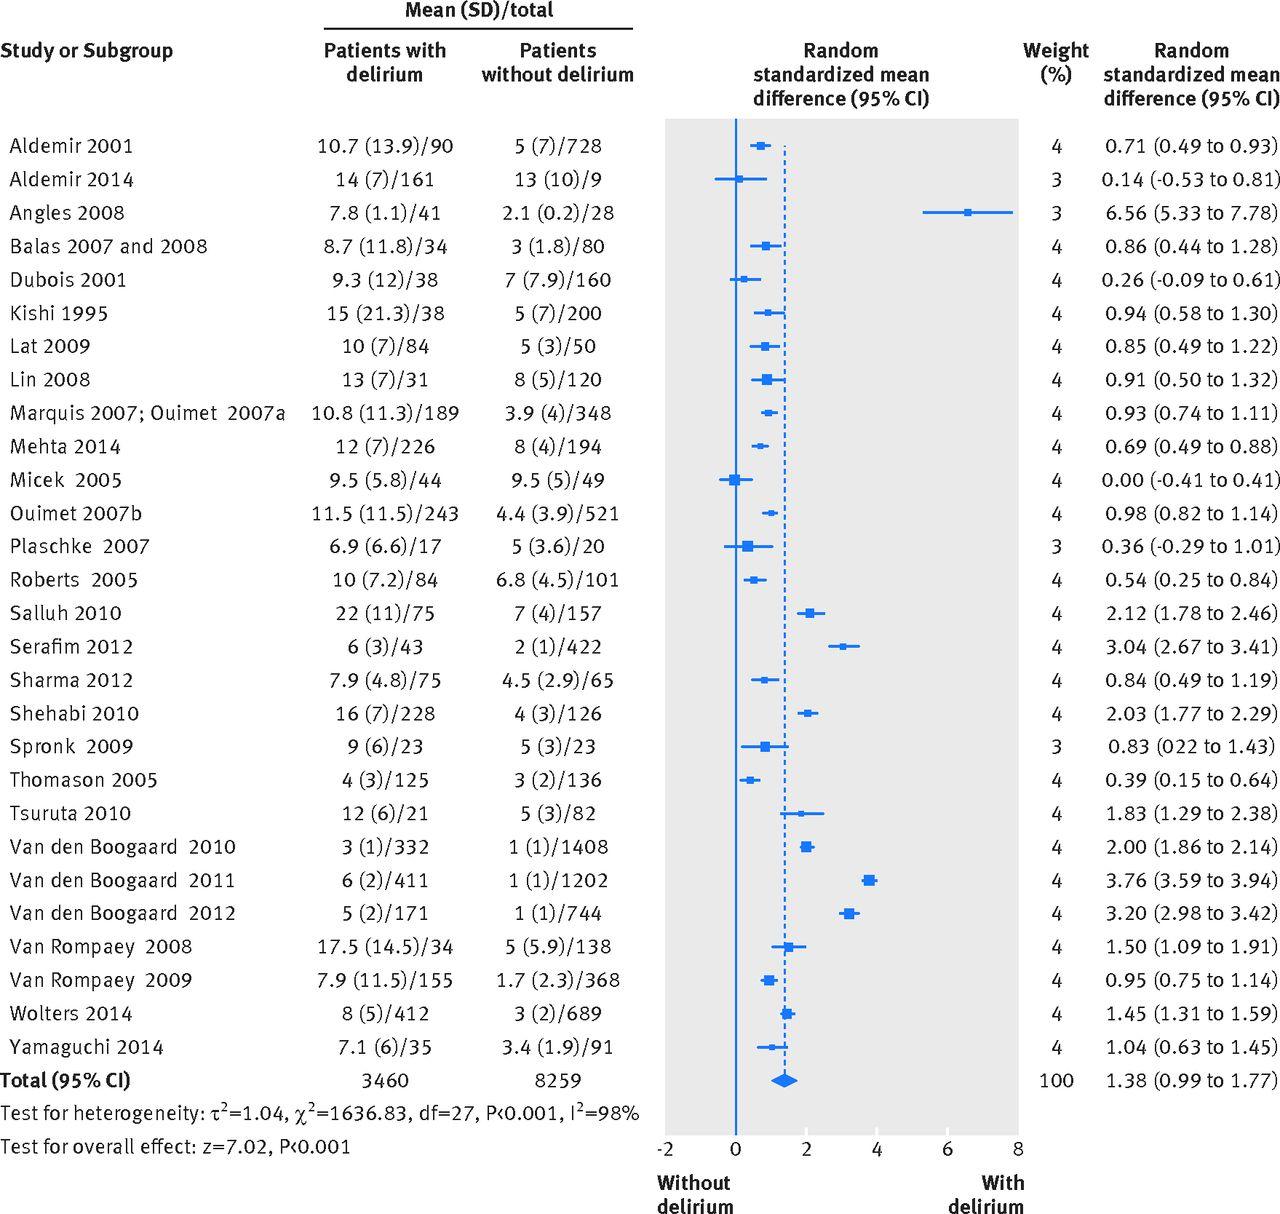 Monitoring Delirium in Critically Ill Patients